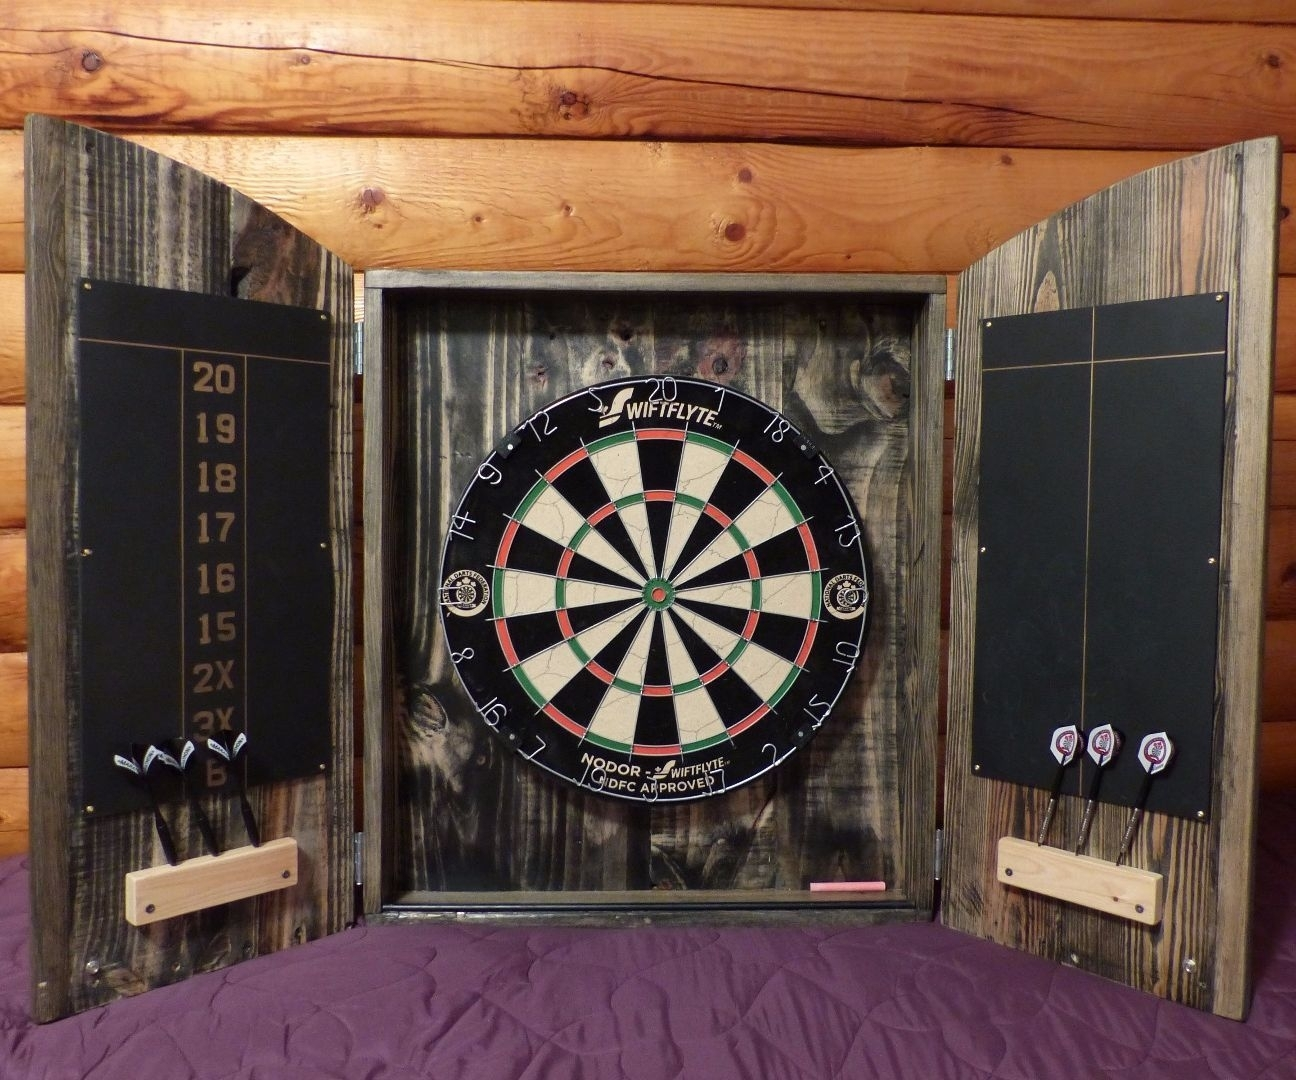 Electronic Dart Board Cabinets